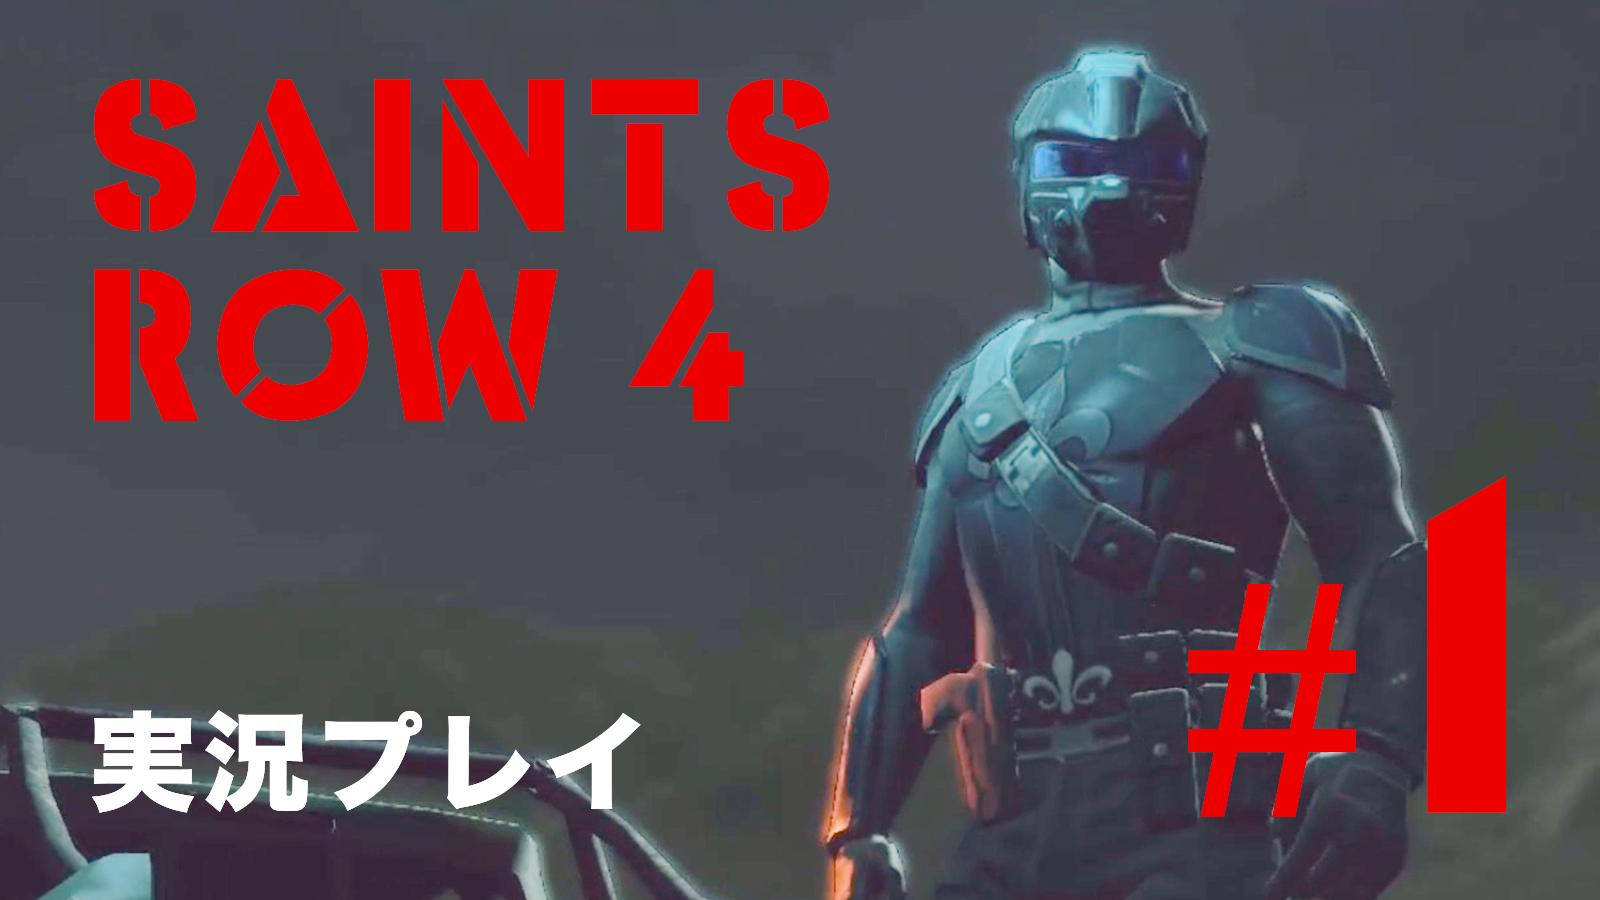 【You Tube】Saints Row4実況プレイ#1 初見プレイのようで初見じゃないプレイ!